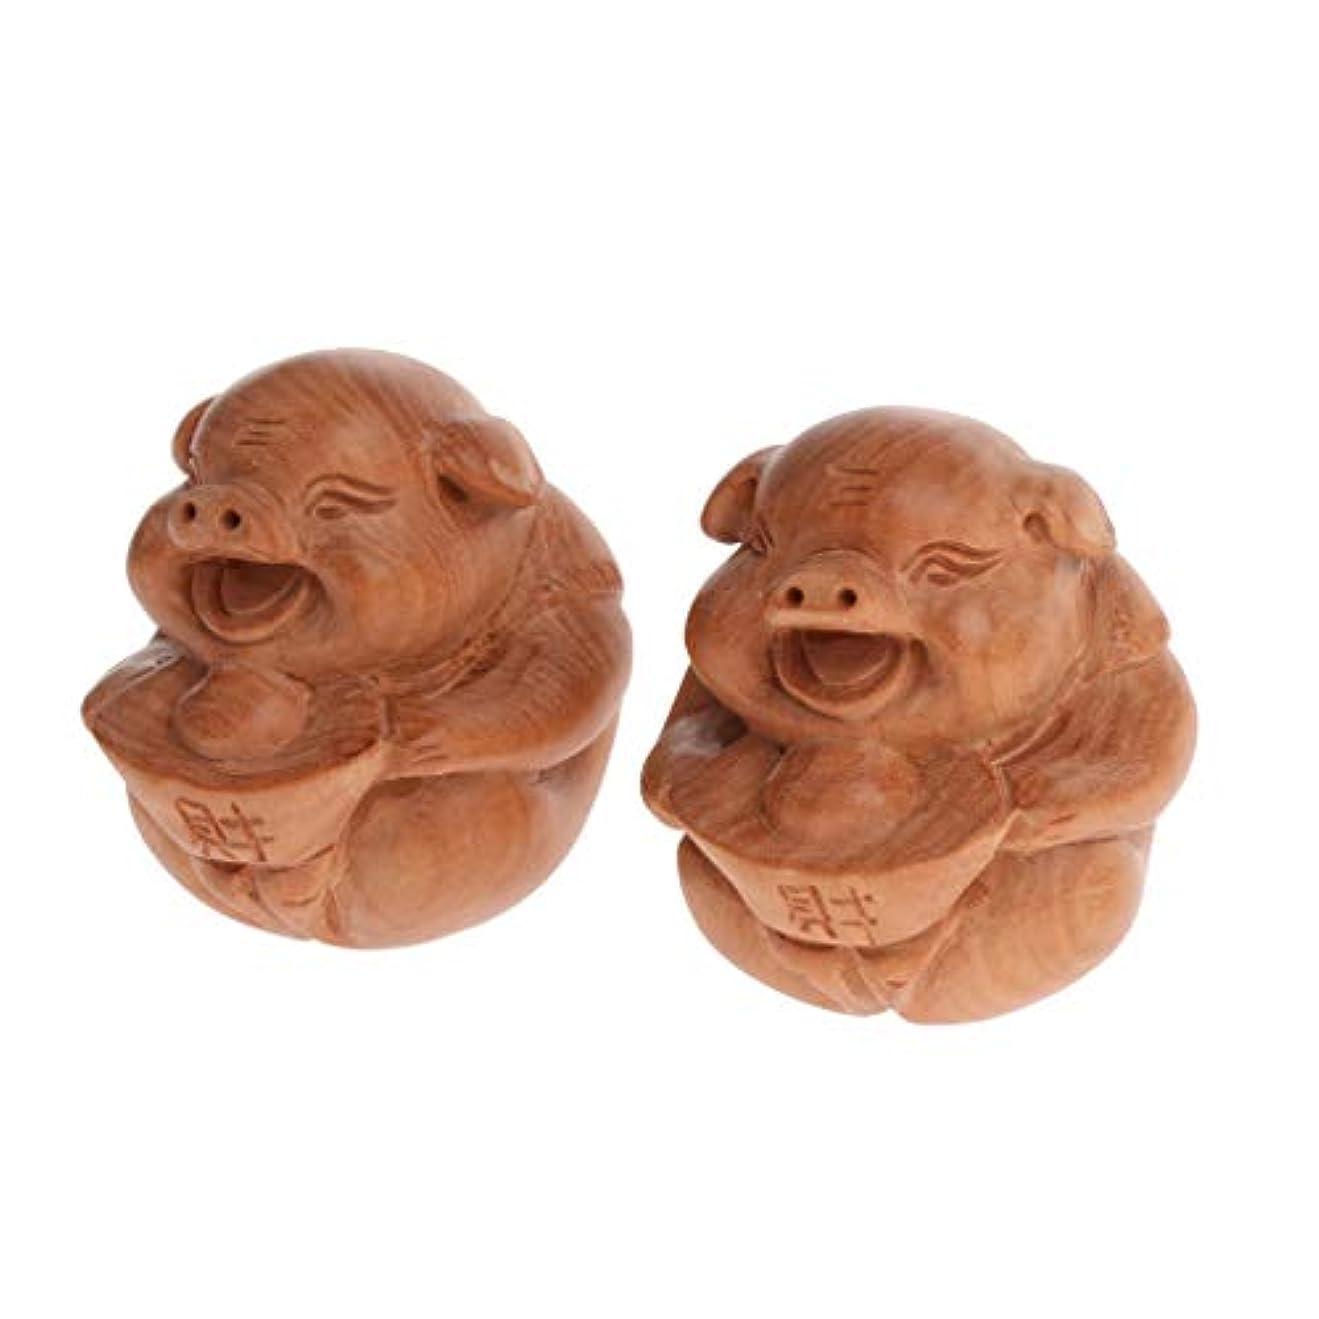 chiwanji 木製 指エクササイズ ボール マッサージボール フェイシャルエステツール 持ち運び 可能